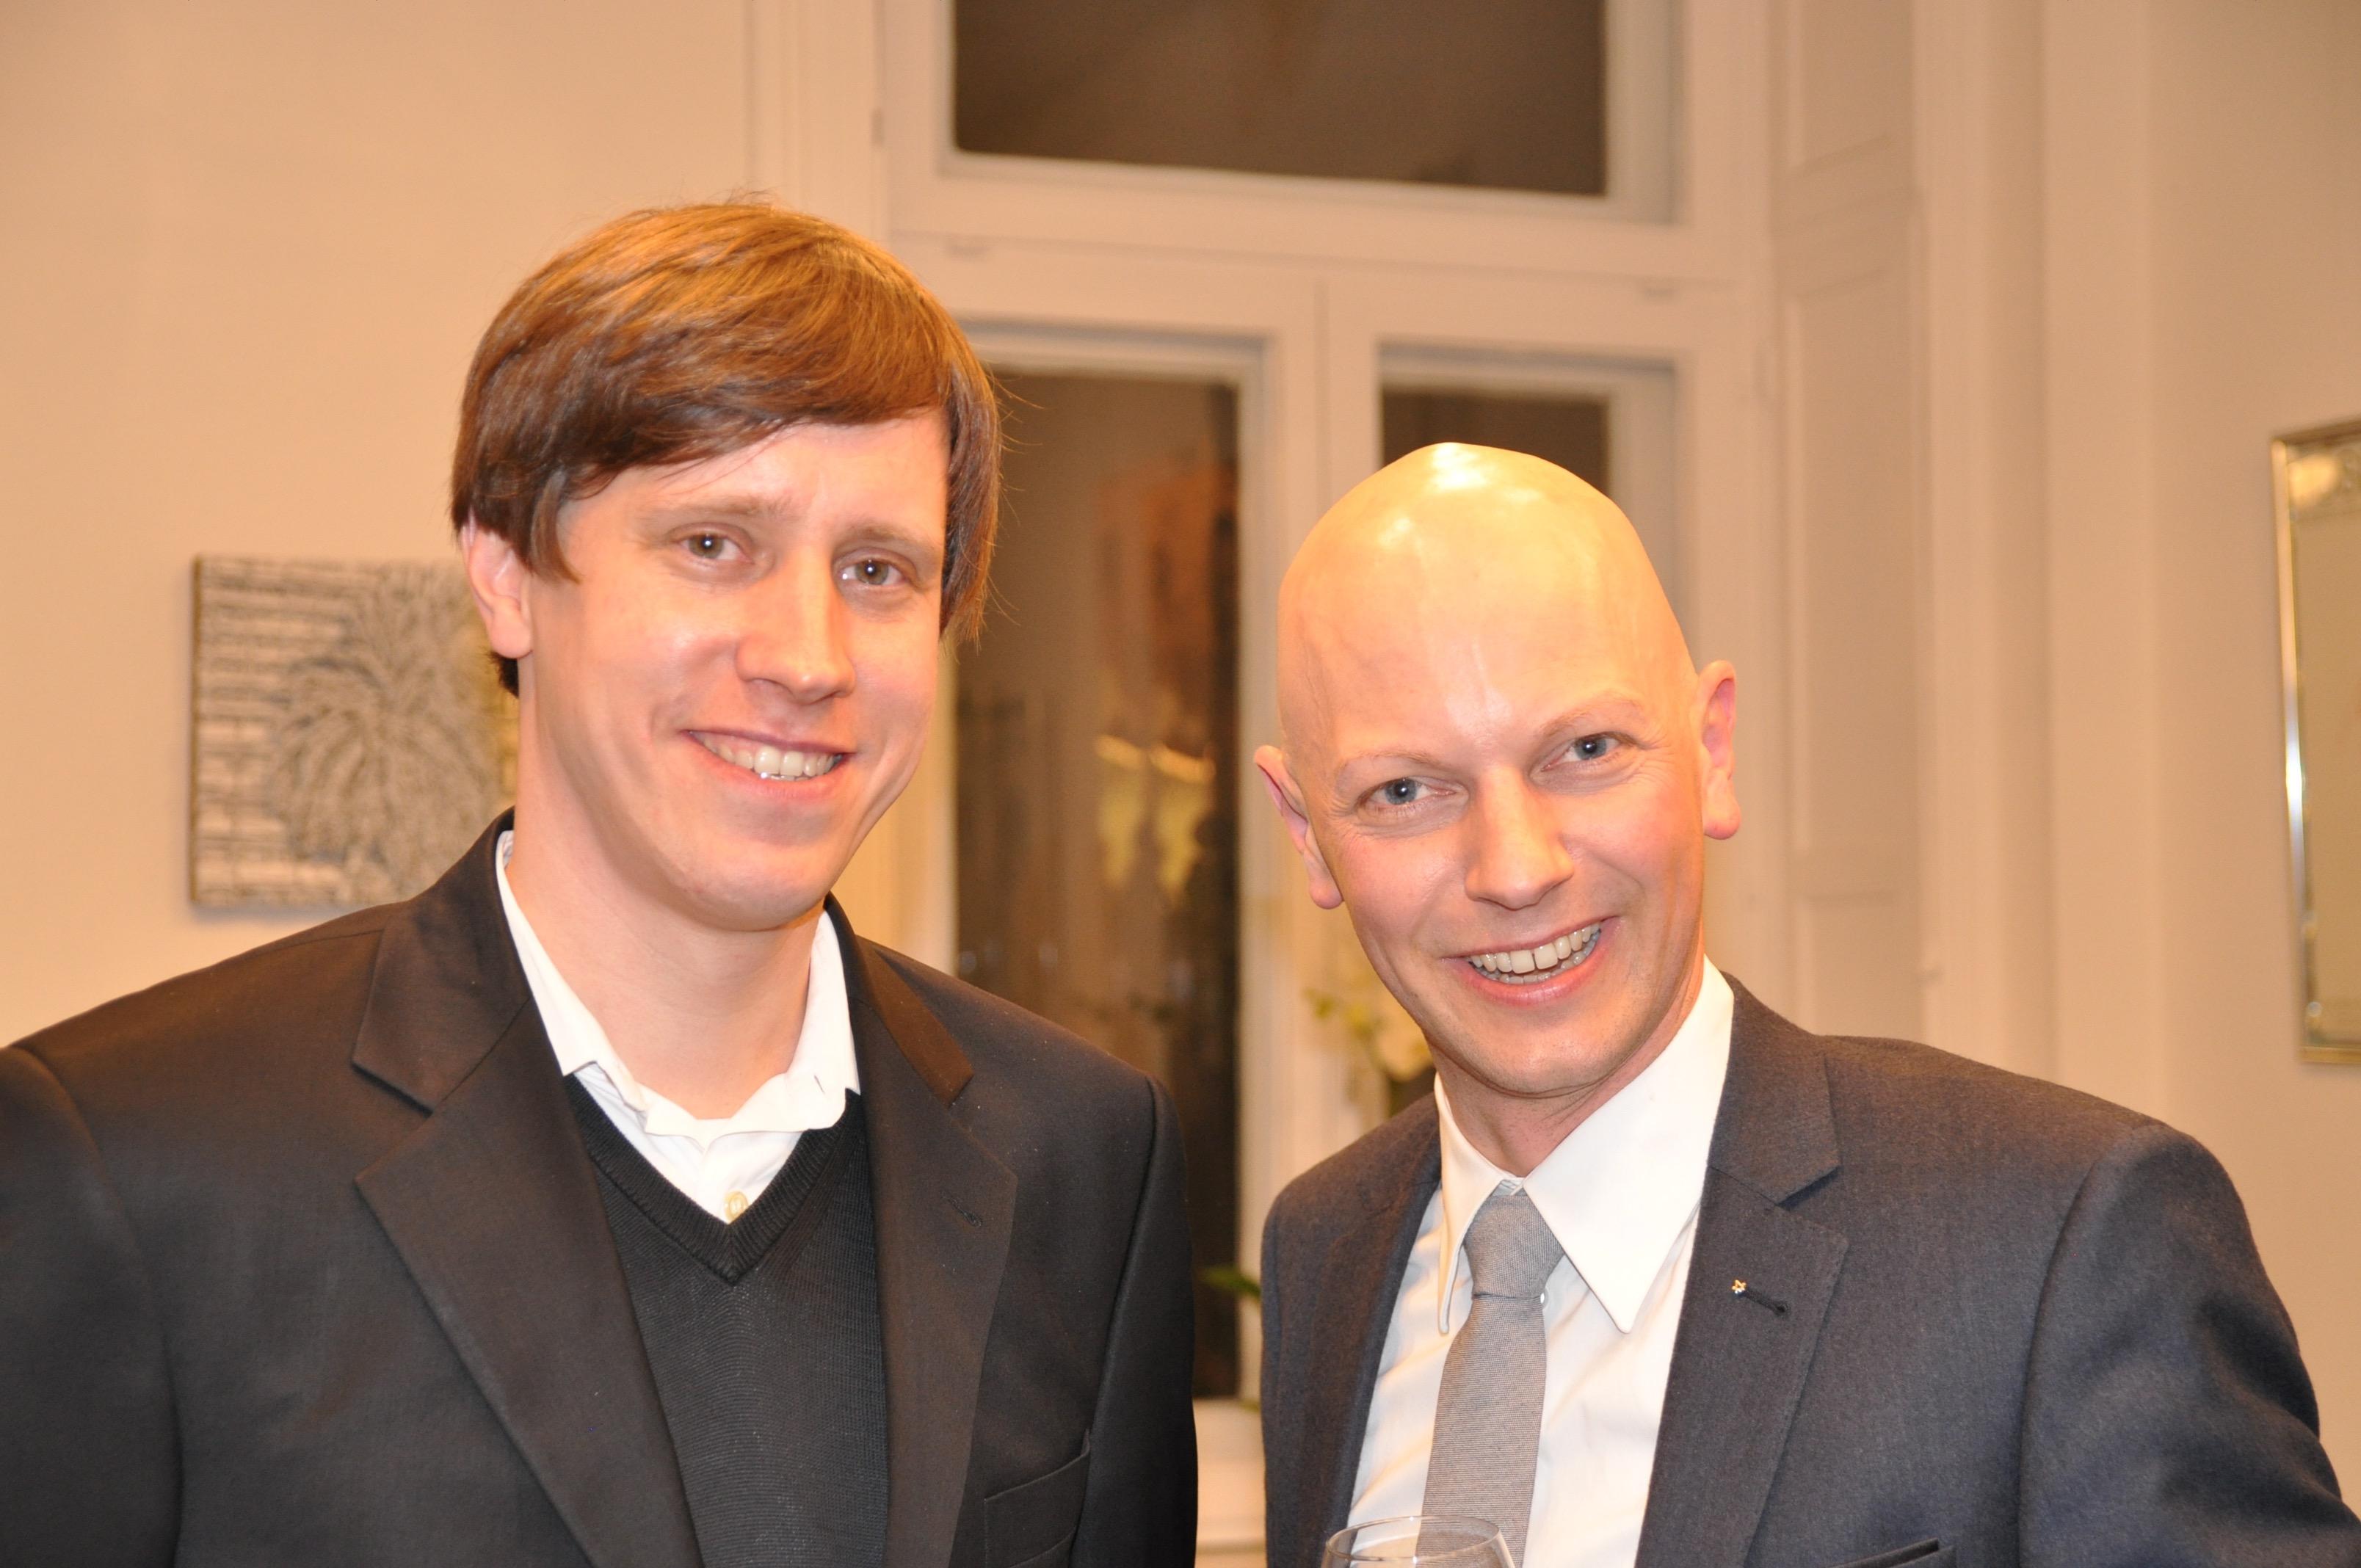 Martin Spengler & Rene Spiegelberger